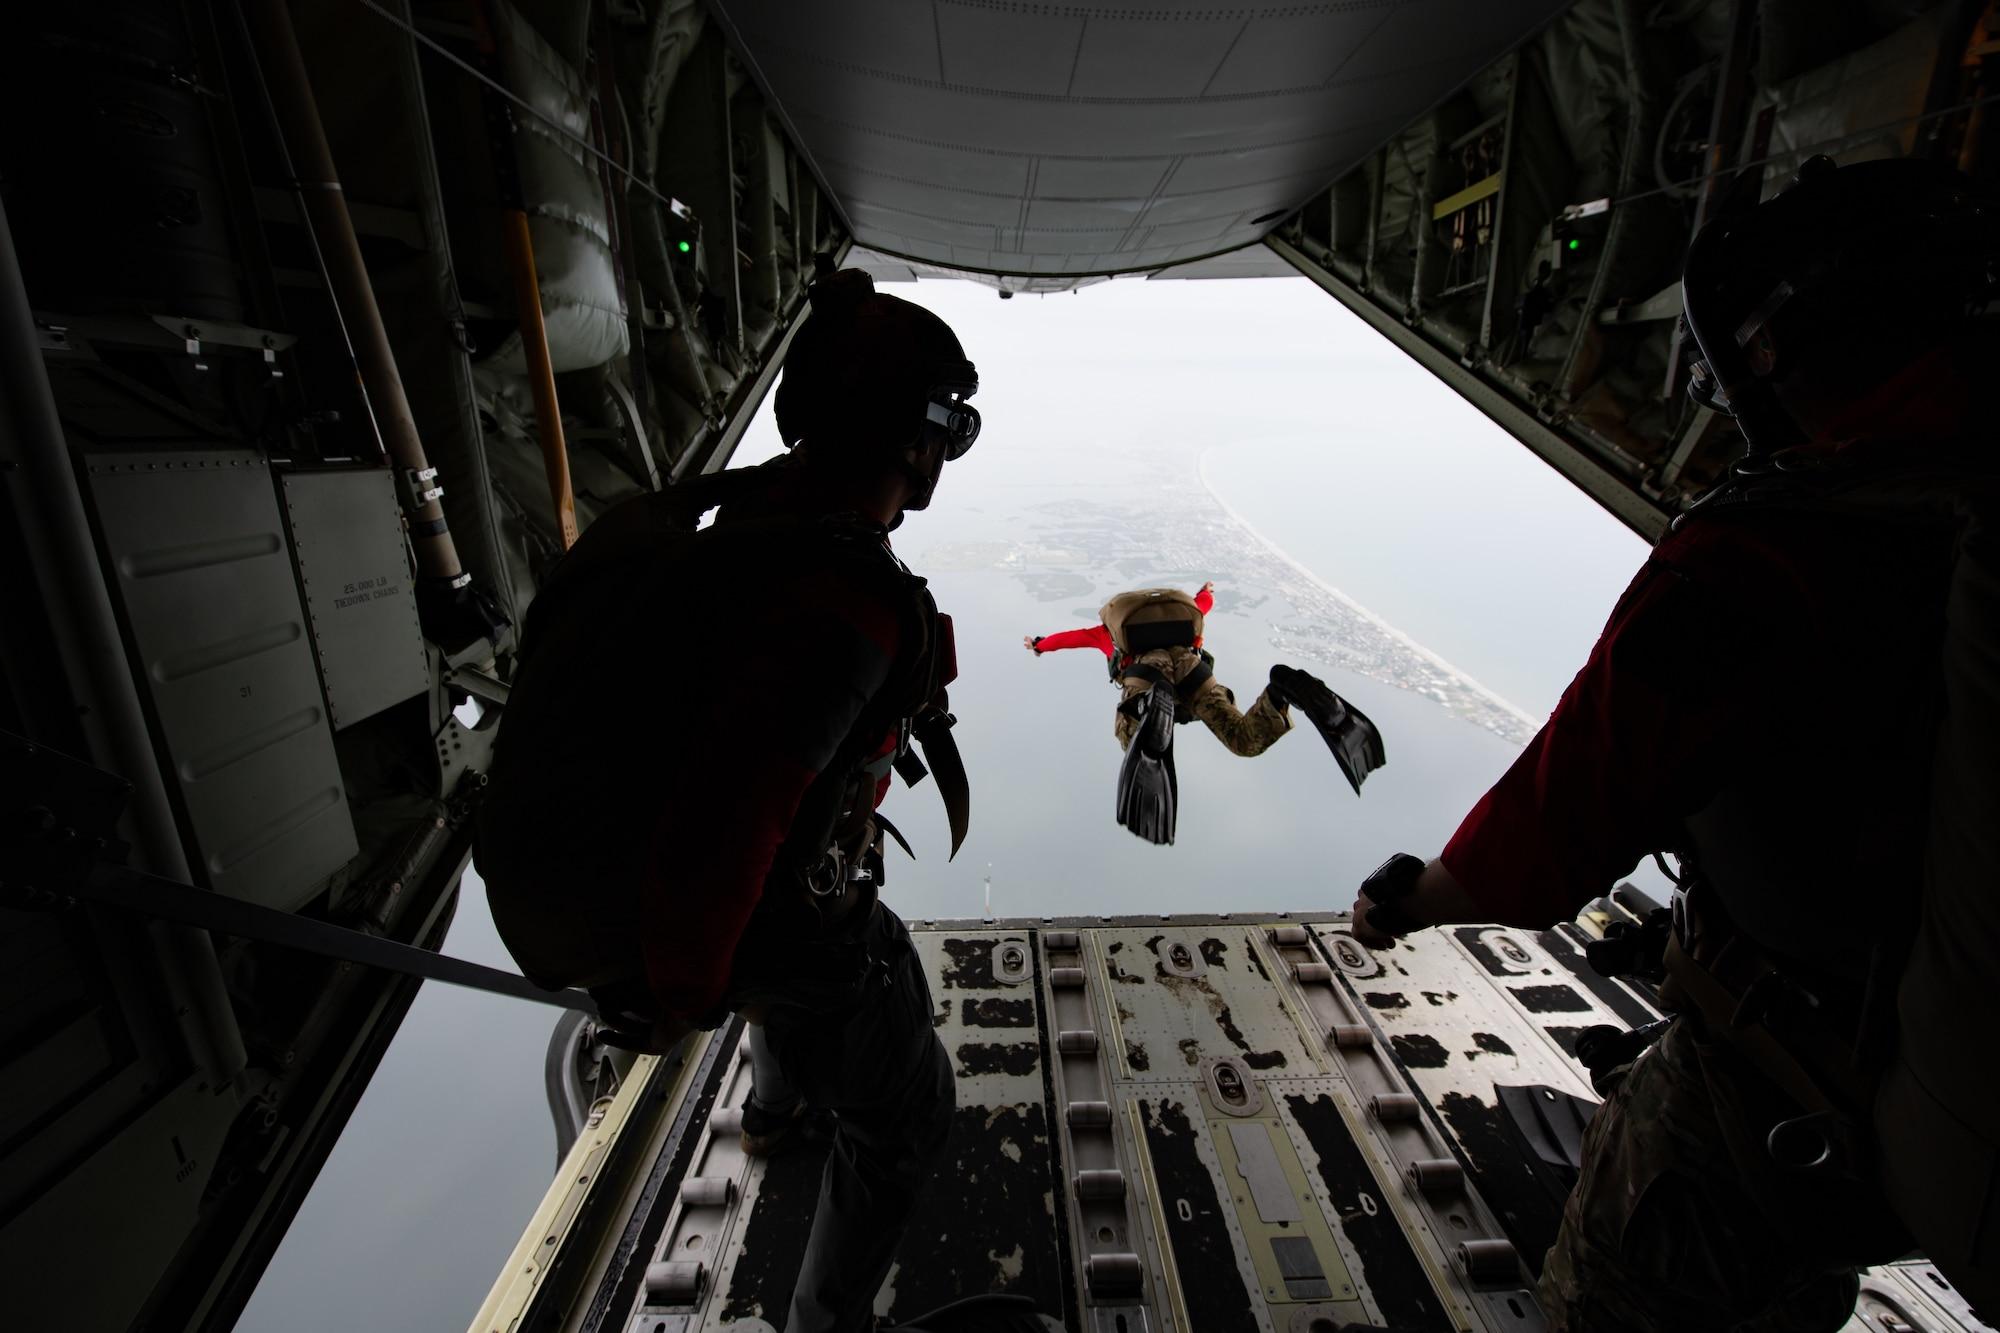 Photo of Airman jumping off an aircraft